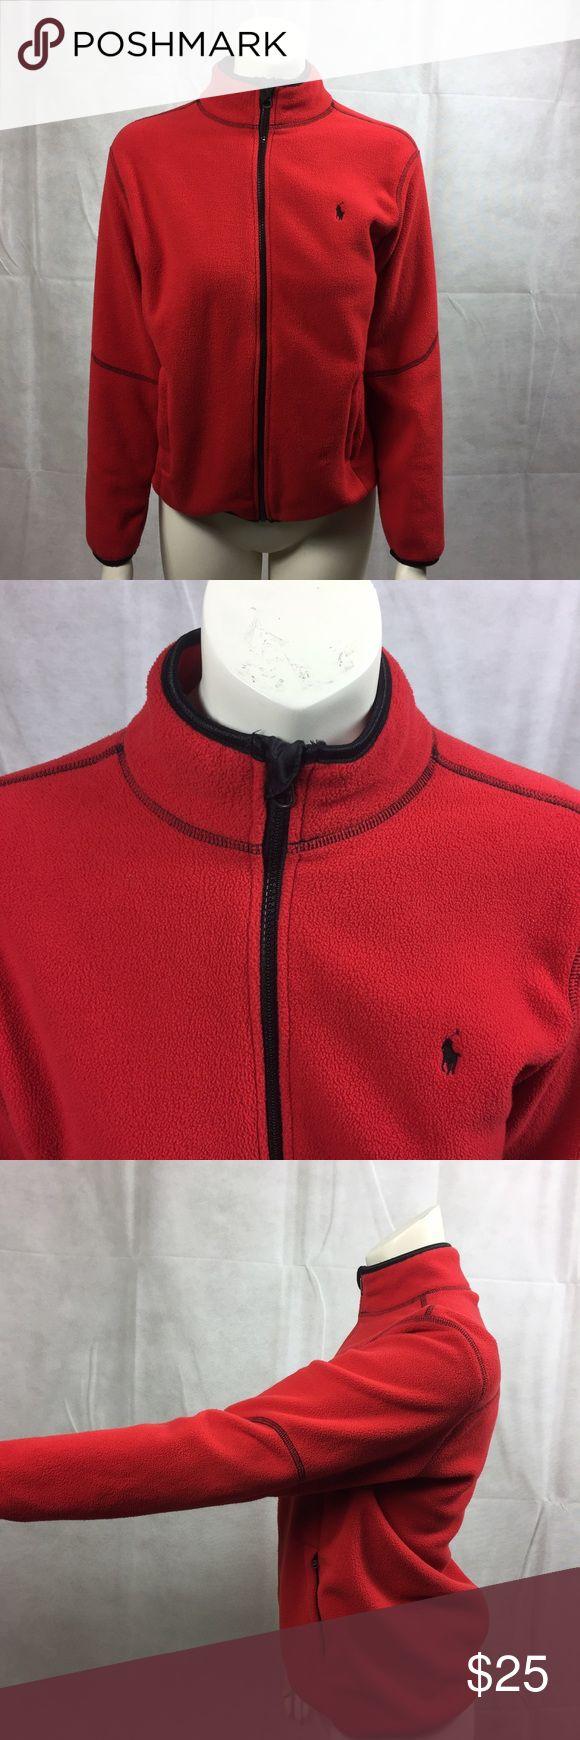 Women's polo jacket size L red black Perfect condition woman's fleece polo Ralph Lauren jacket. Size L. Colors: red & black Polo by Ralph Lauren Jackets & Coats